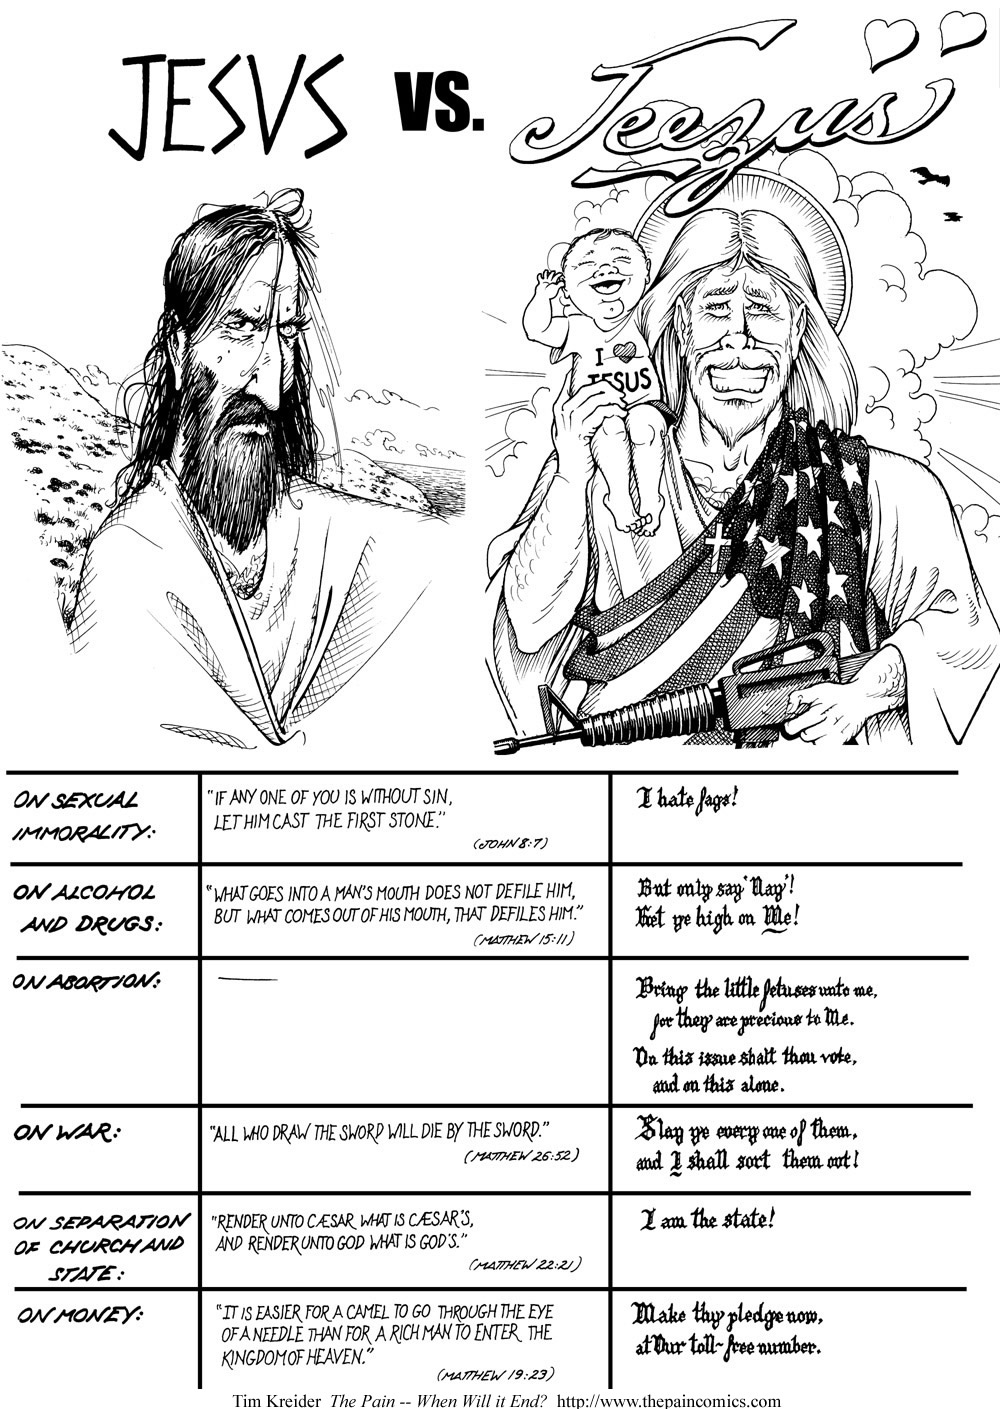 [Image: Jesus%20vs.%20Jeezus.jpg]